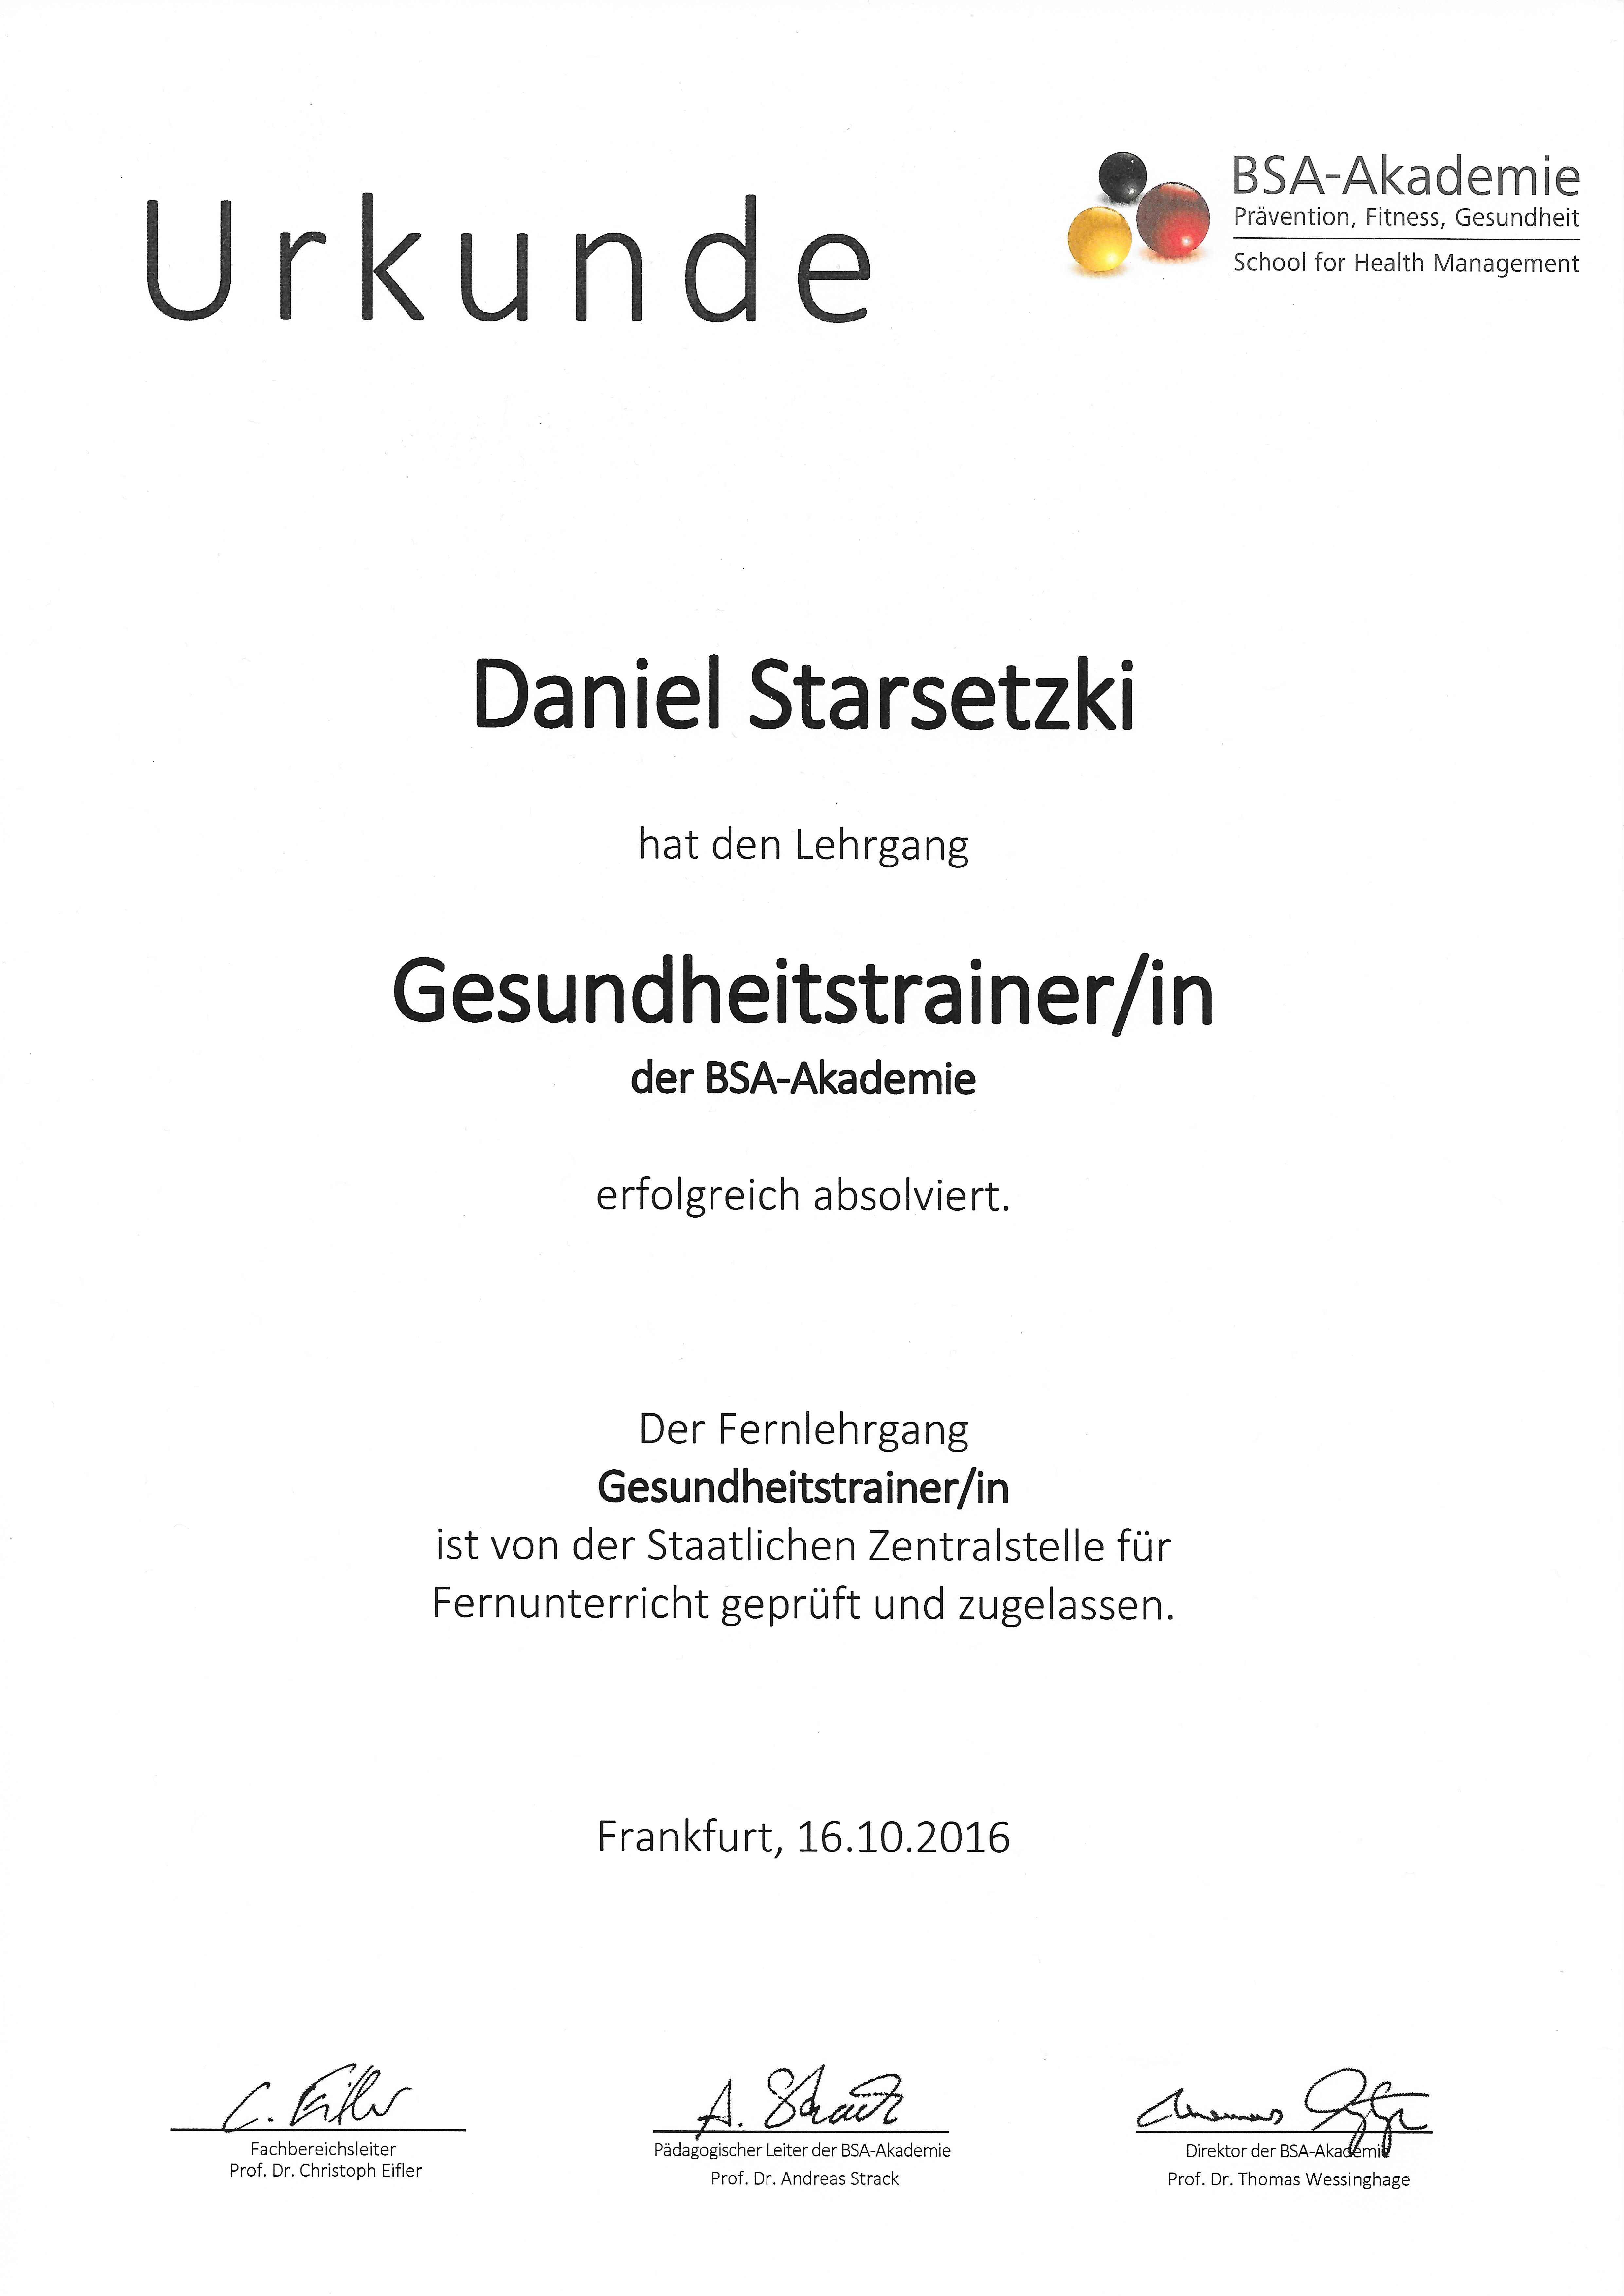 Gesundheitstrainer/in